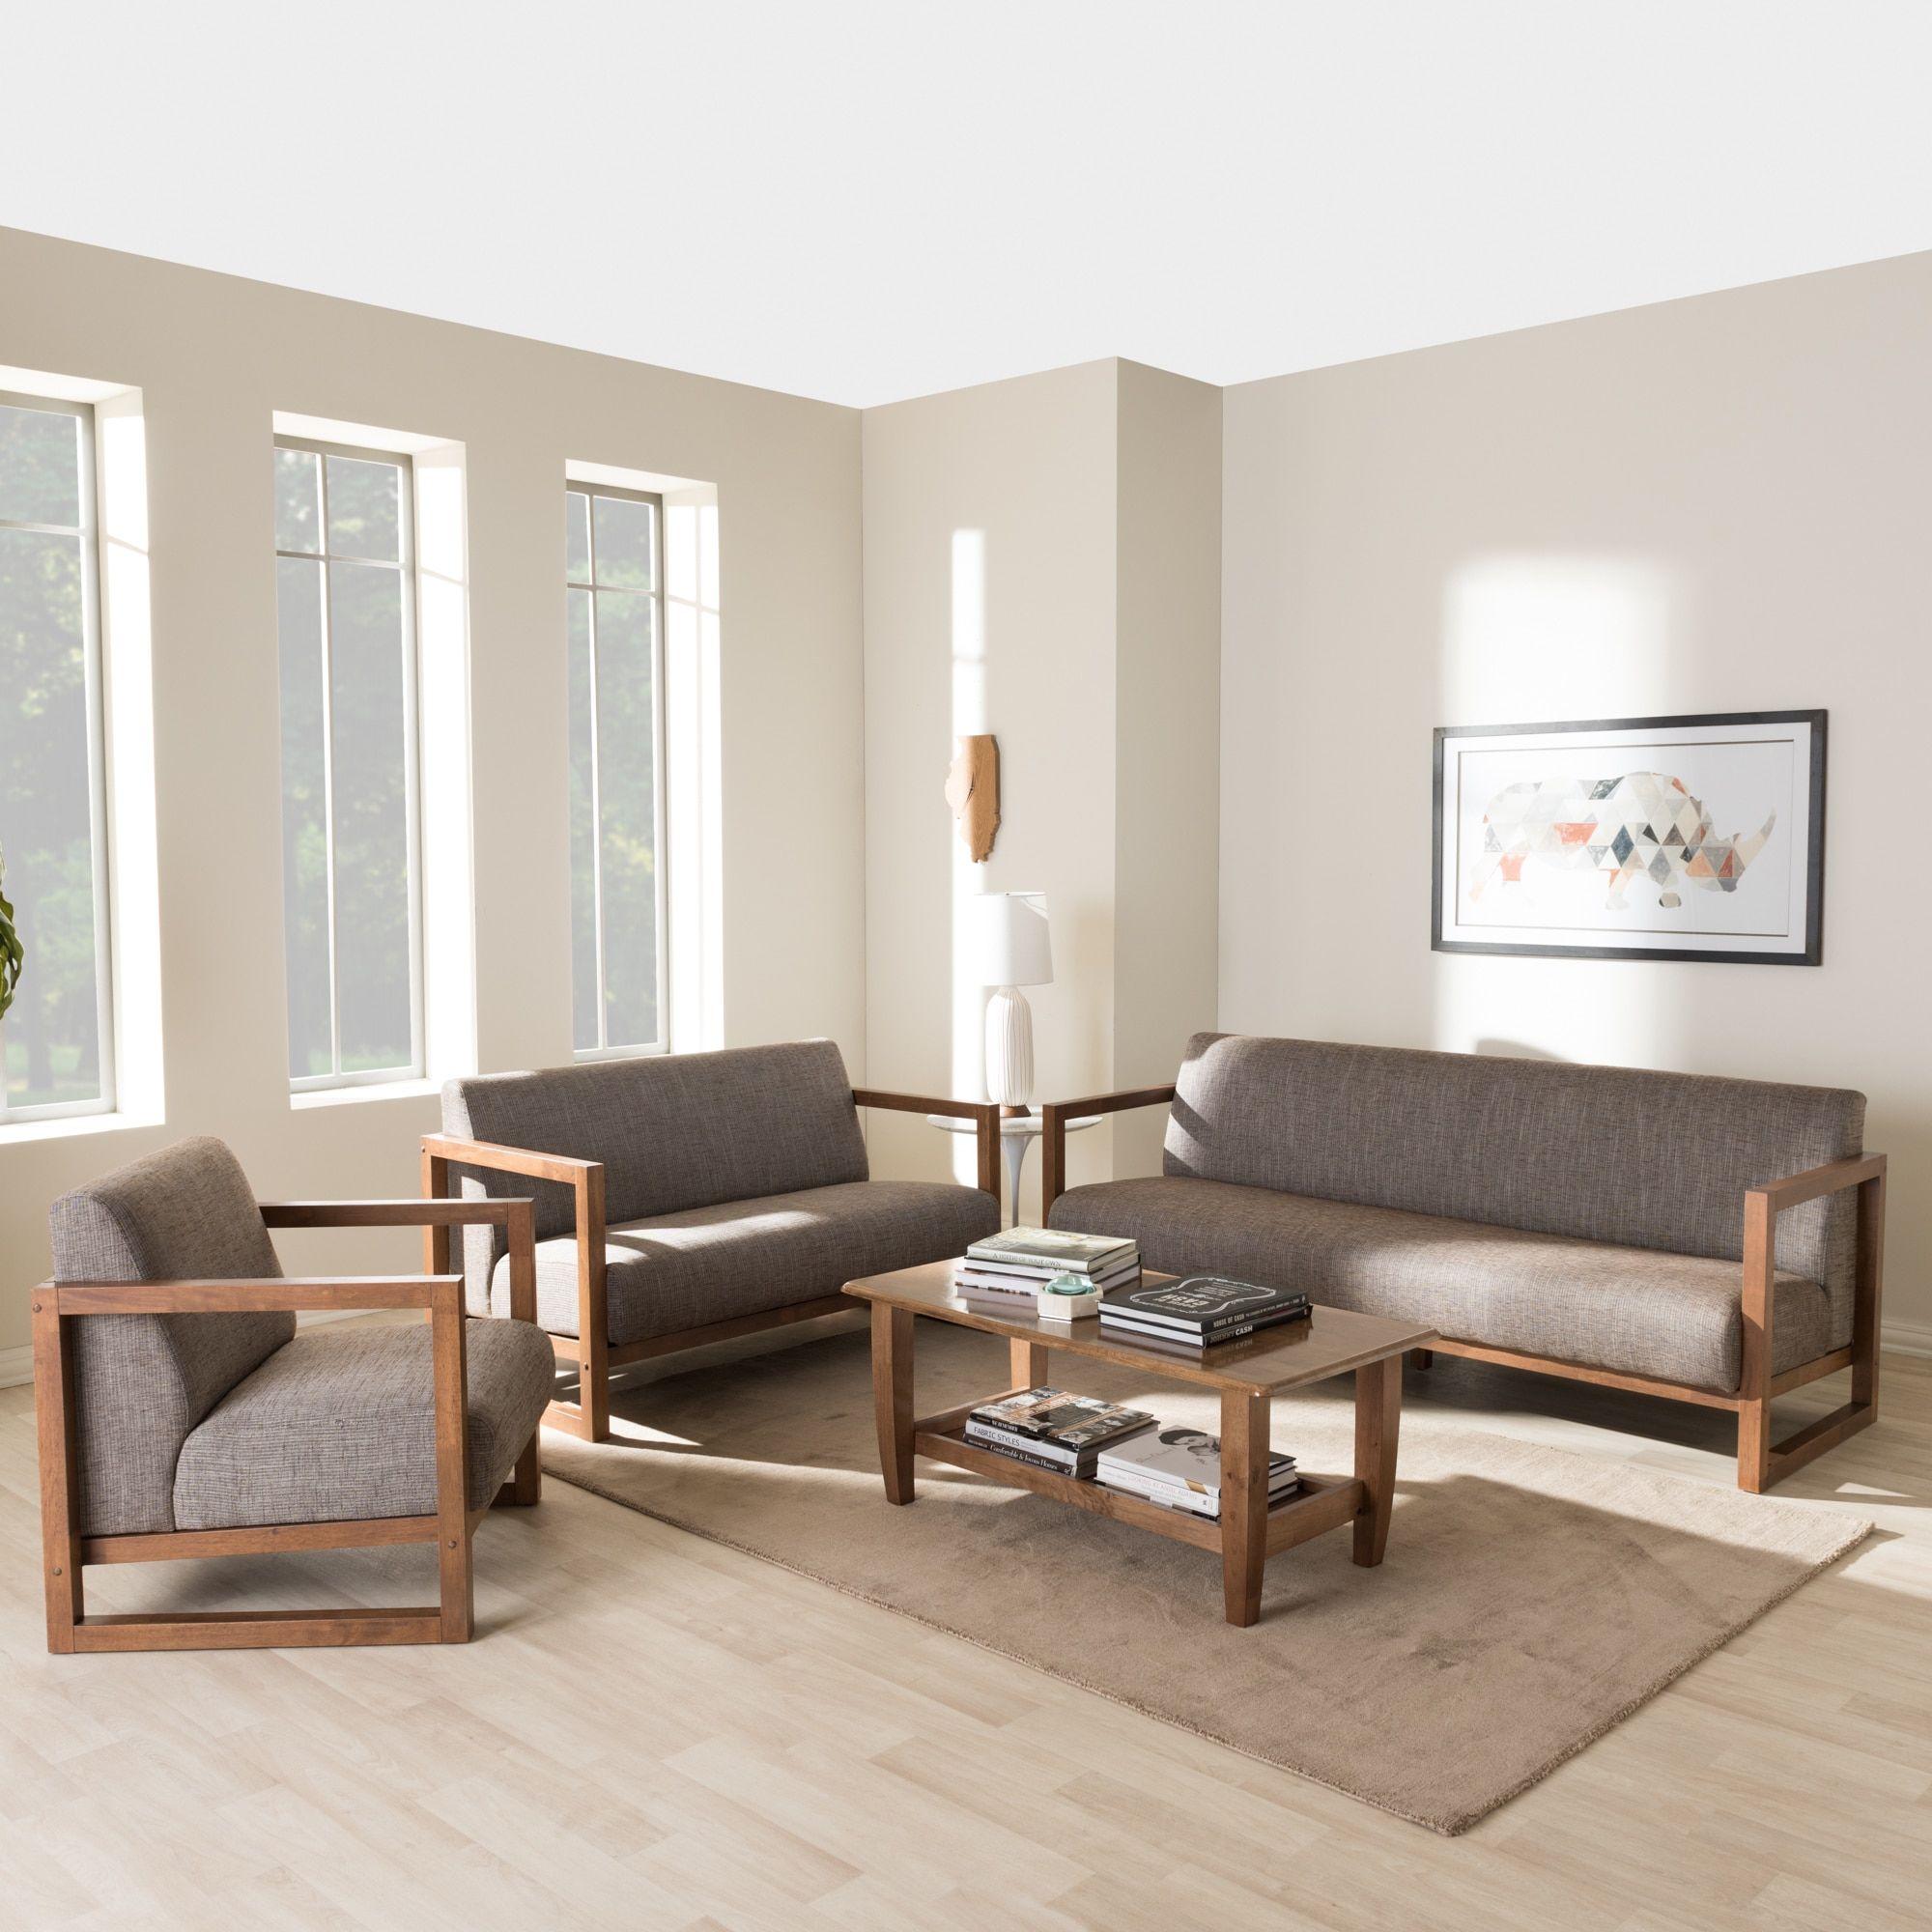 Baxton Studio Philomela Mid-Century Modern Walnut wood Finished Gravel Upholstered 3-Piece Living Room Set